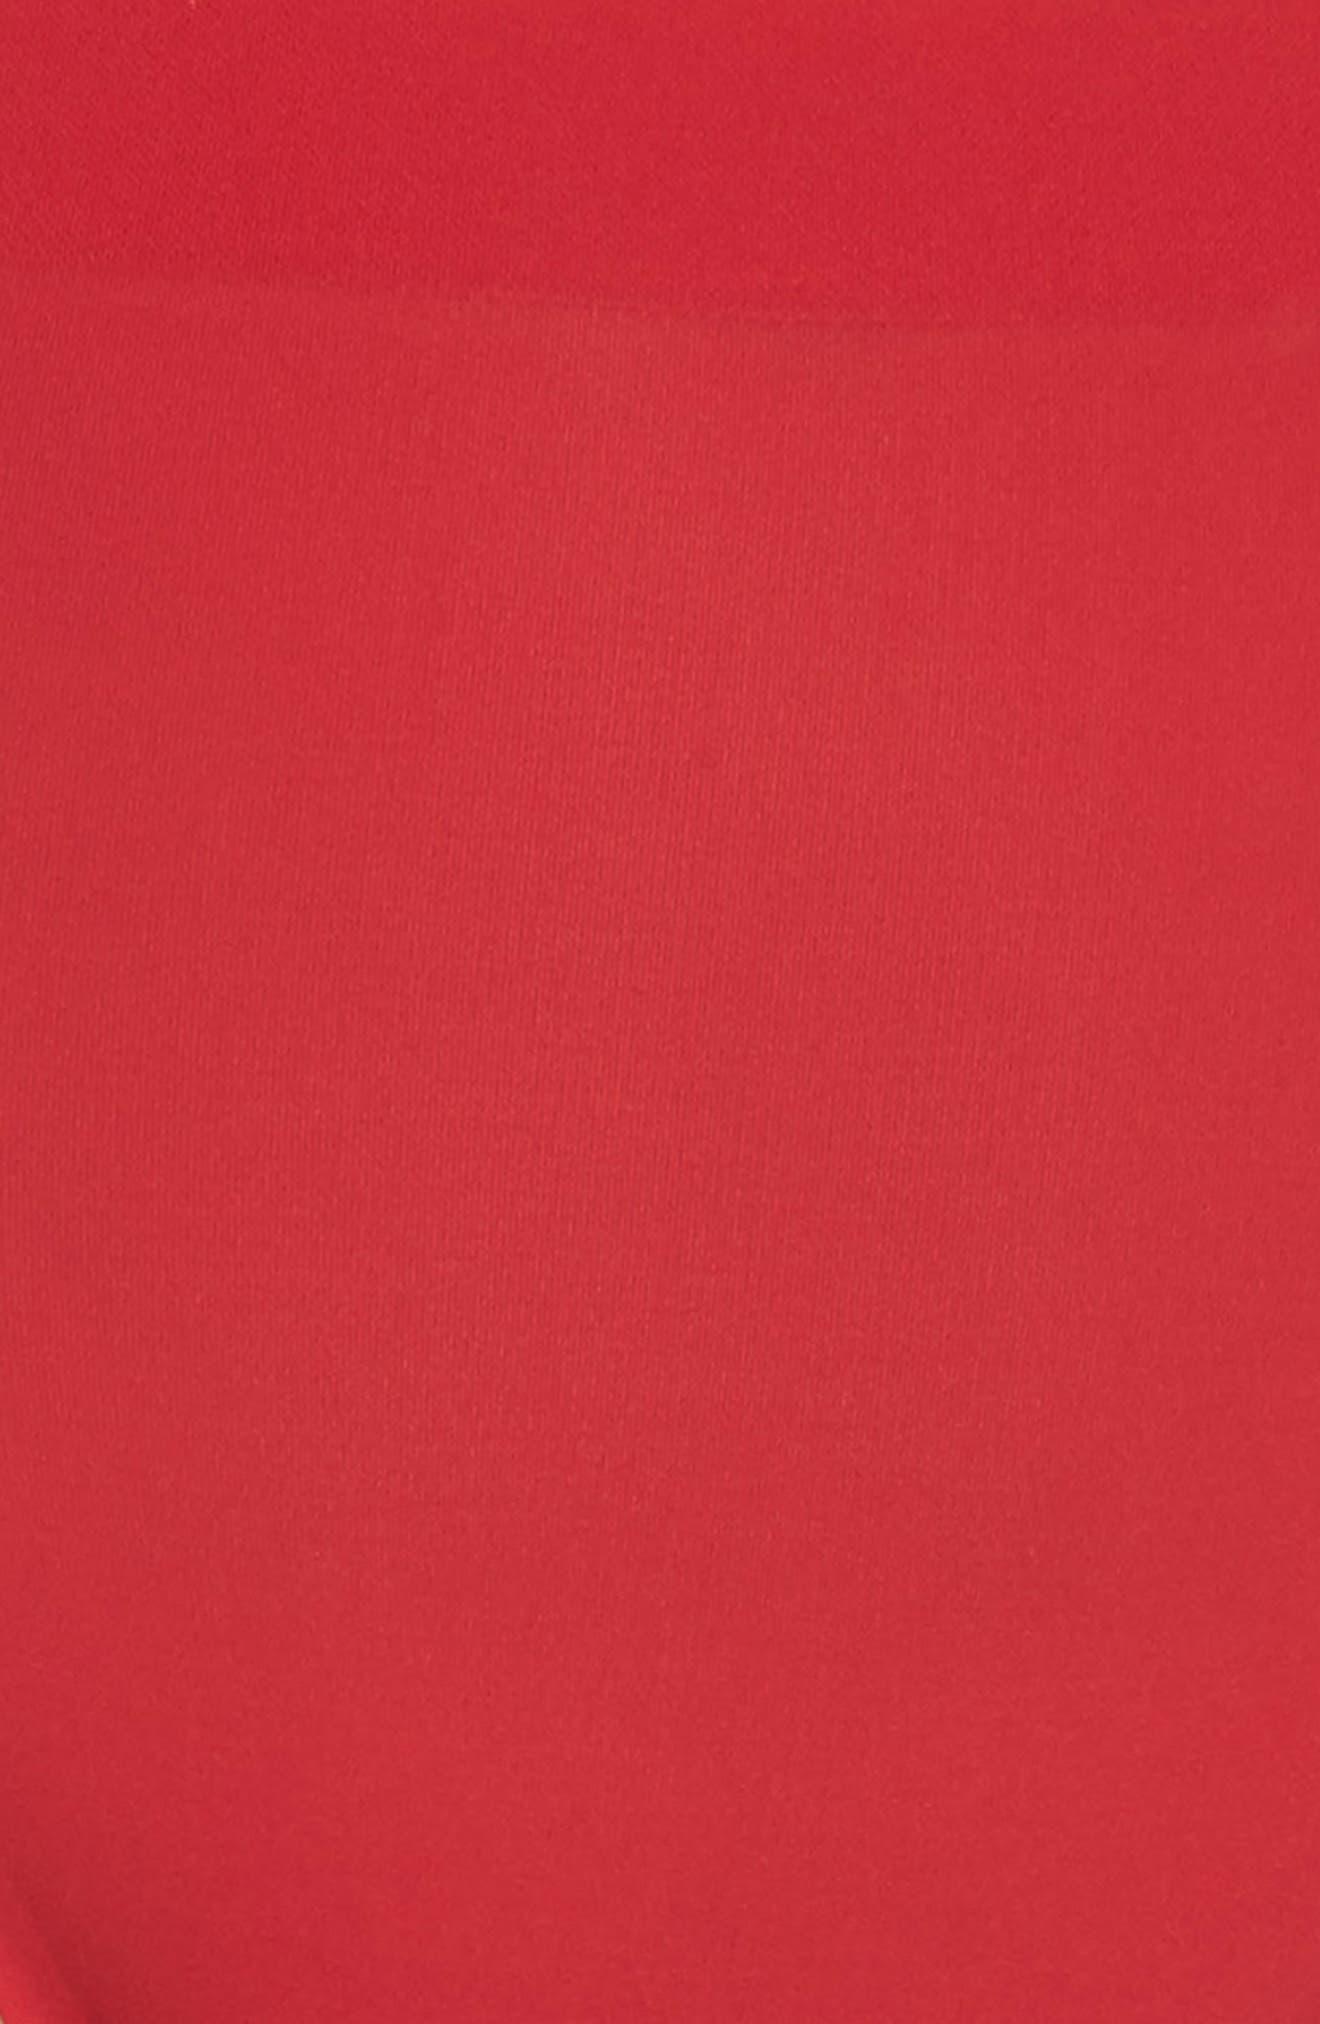 'Skinsense' Seamless High Cut Briefs,                             Alternate thumbnail 5, color,                             Tango Red